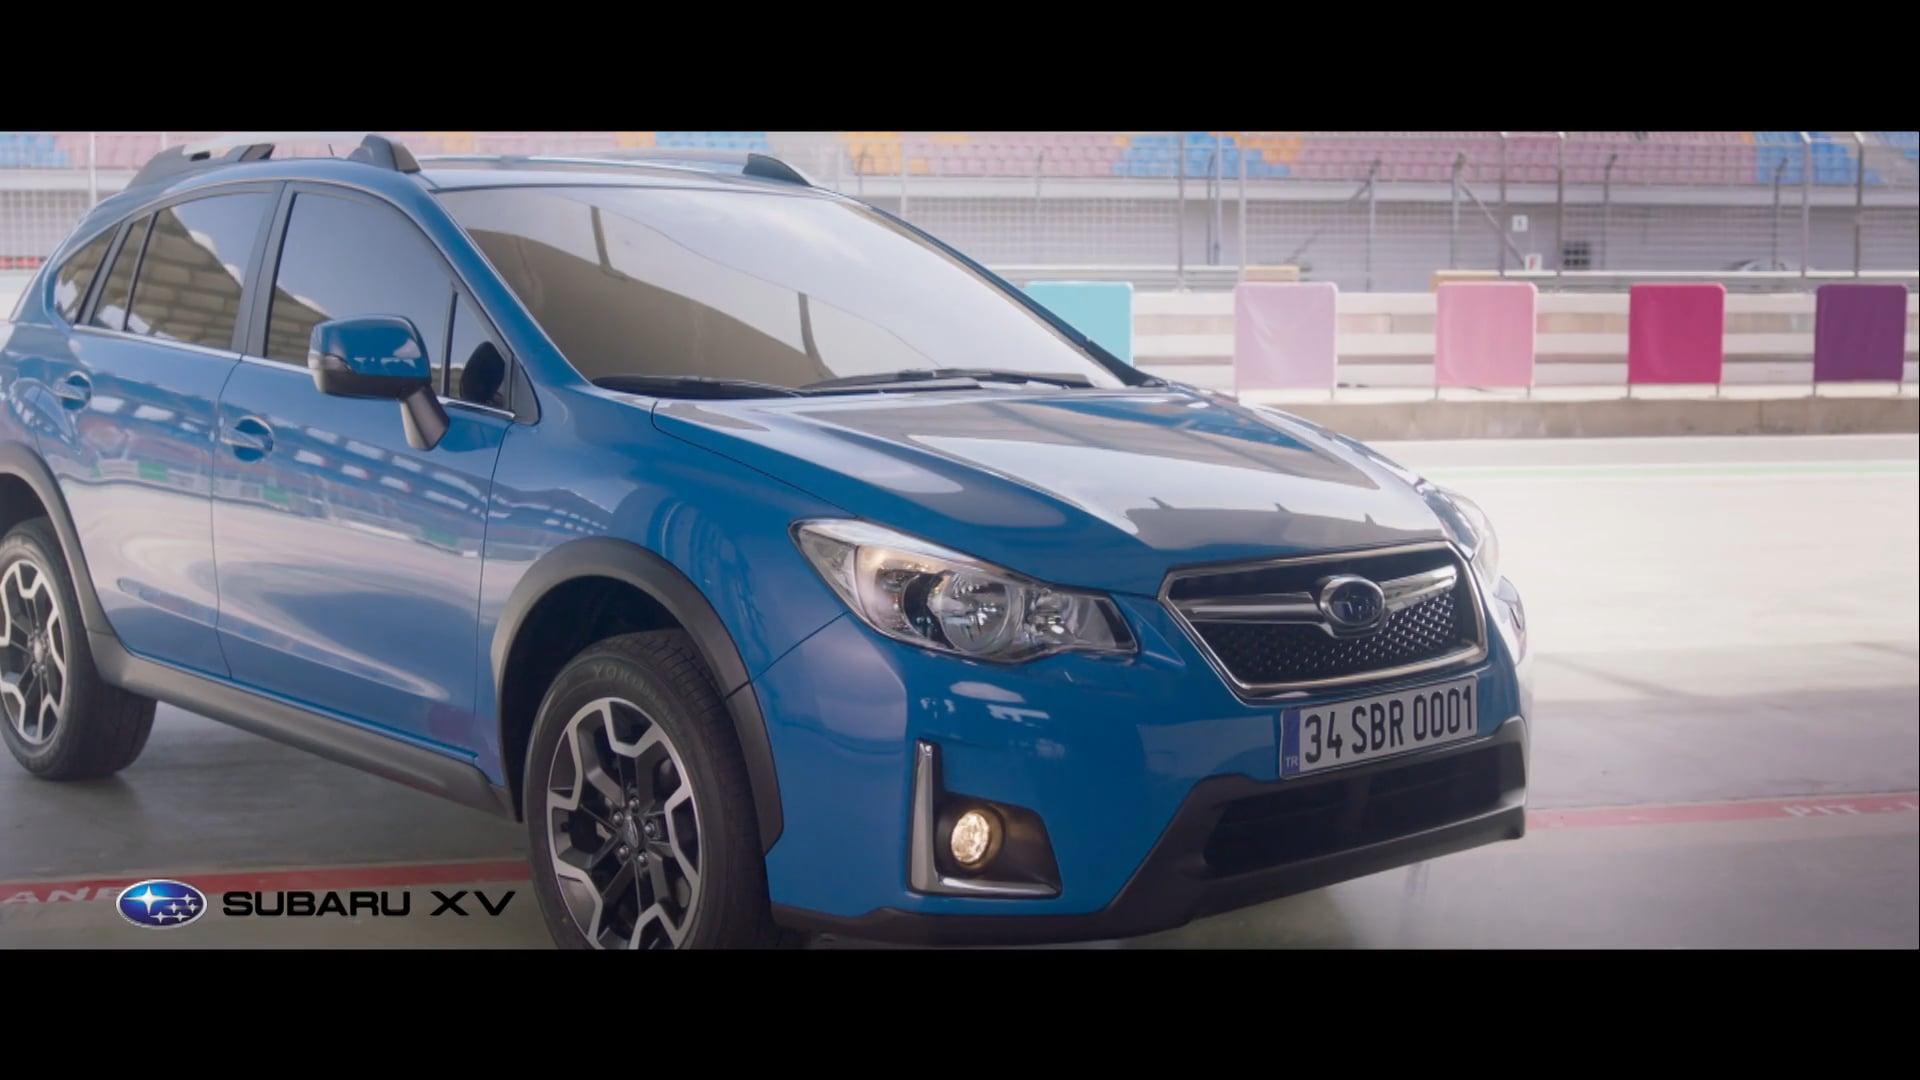 Bora Egemen Subaru XV Benim Starim-Celebrit/ Car